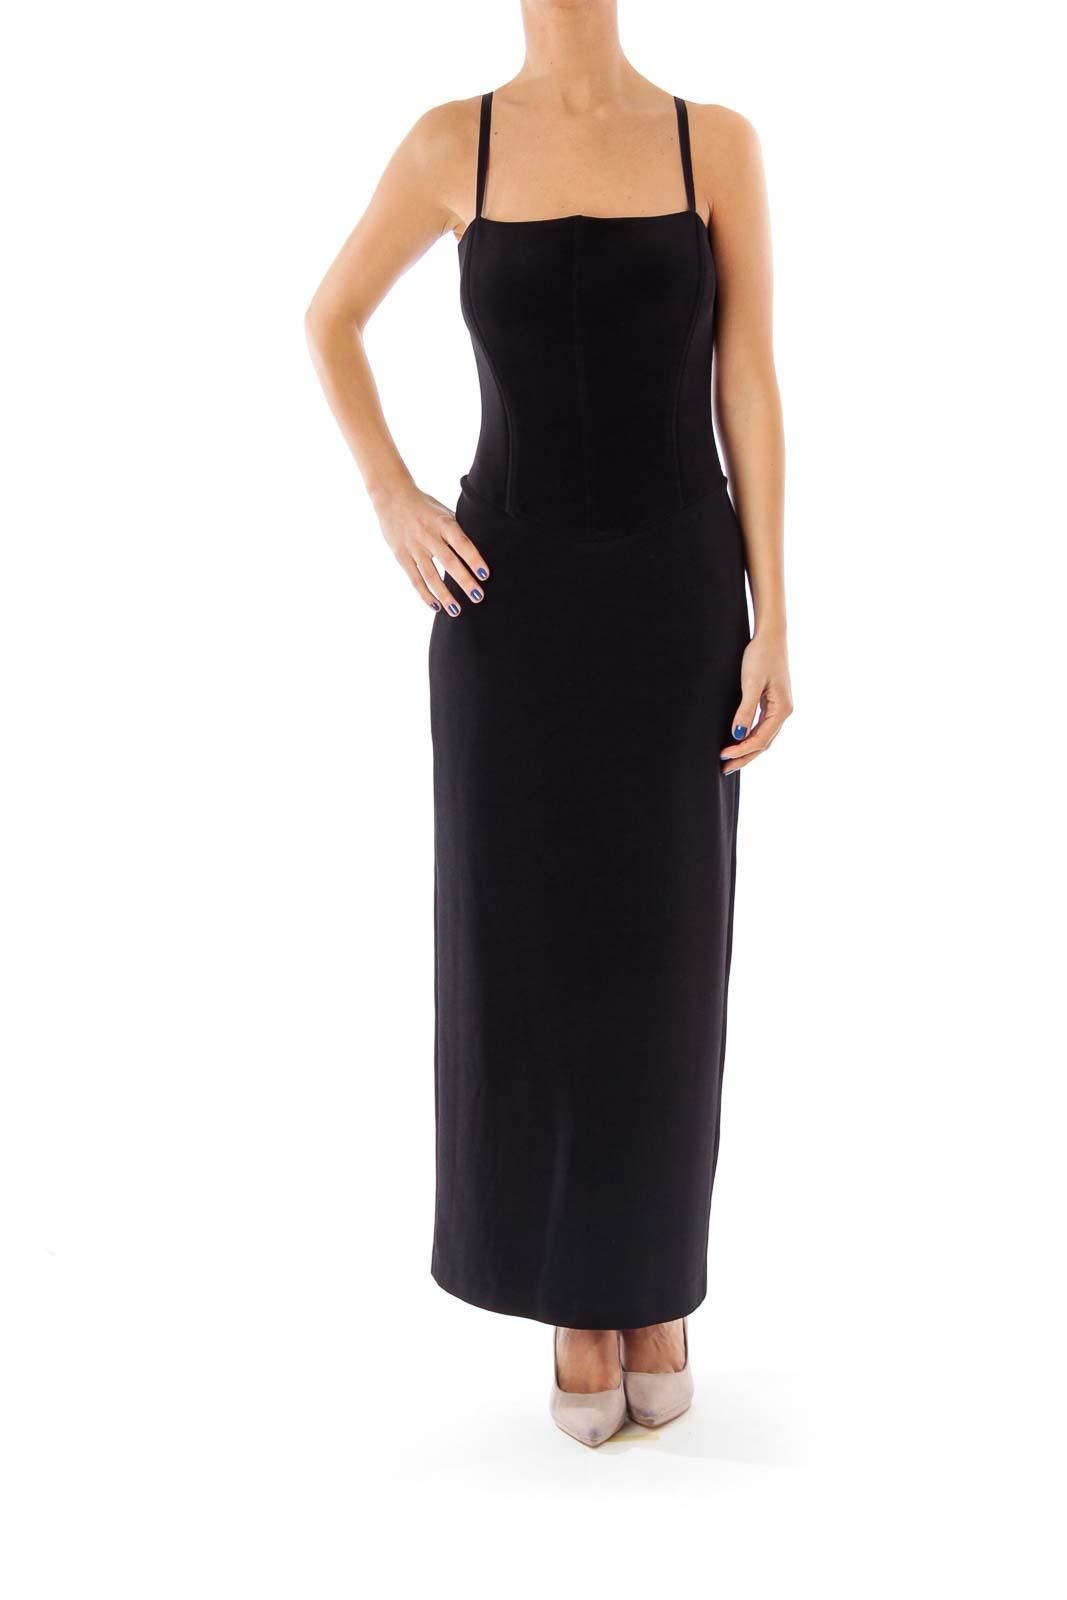 Black Open Back Evening Dress